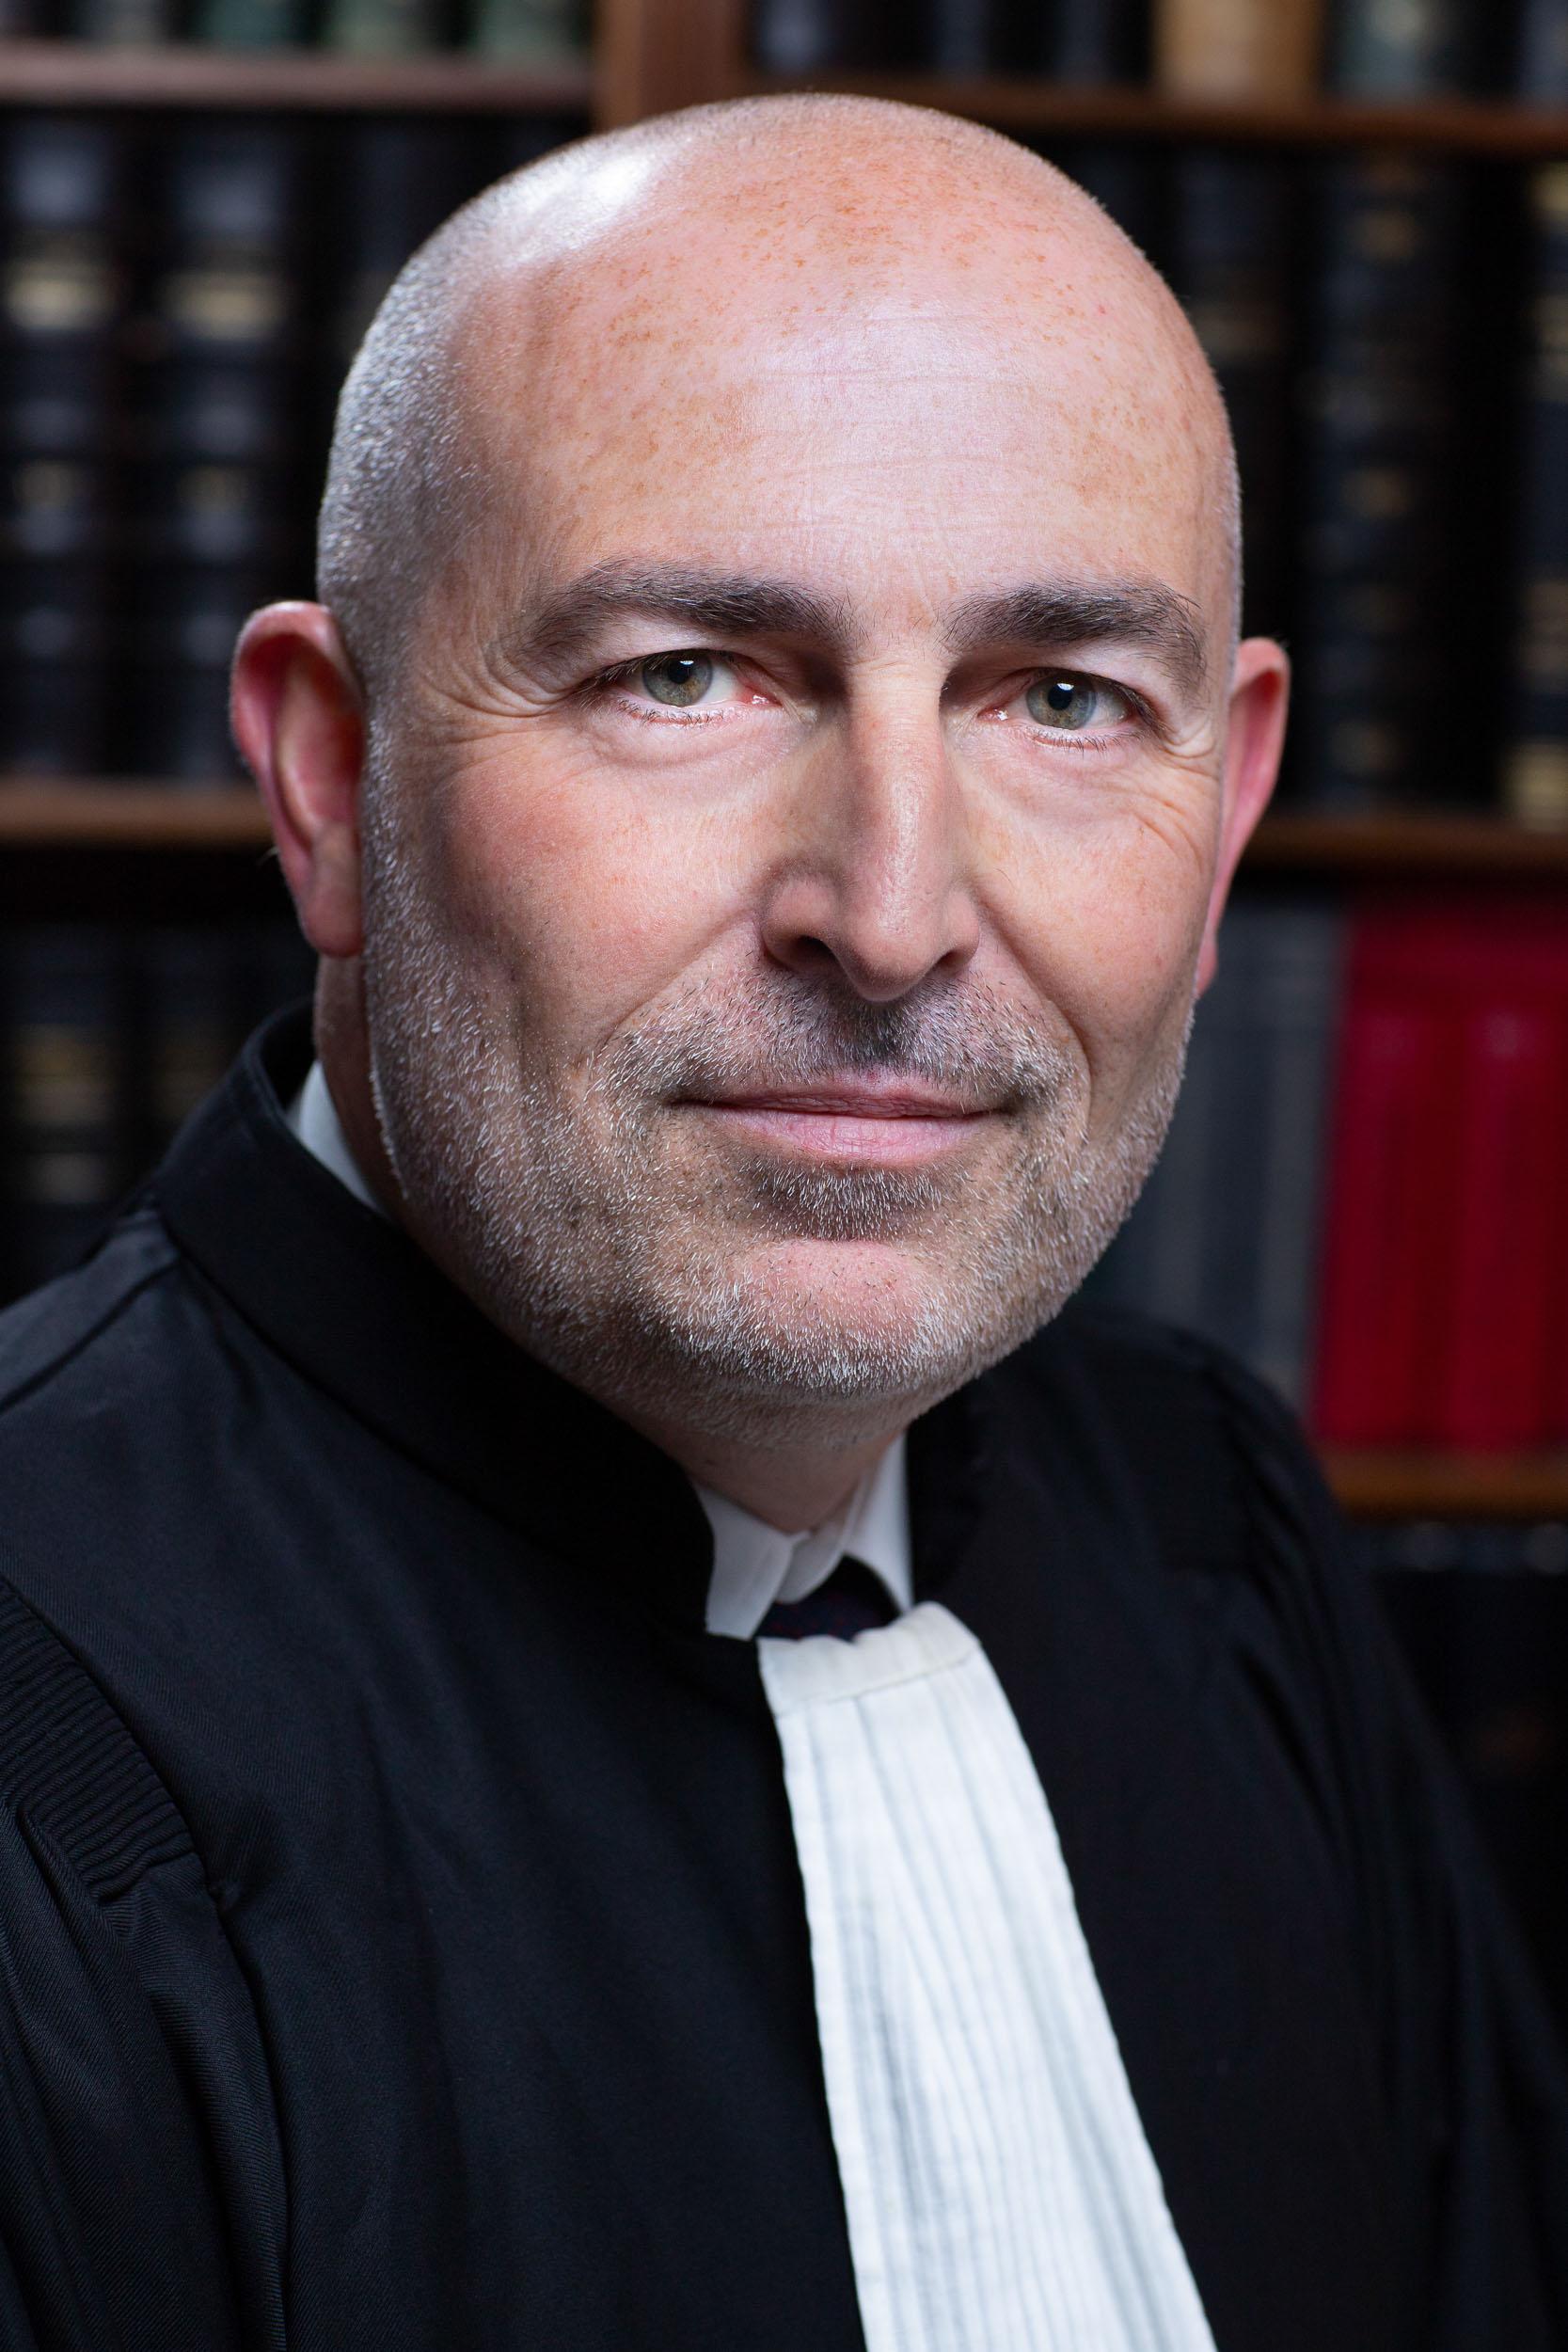 photographe-avocats-annecy-23